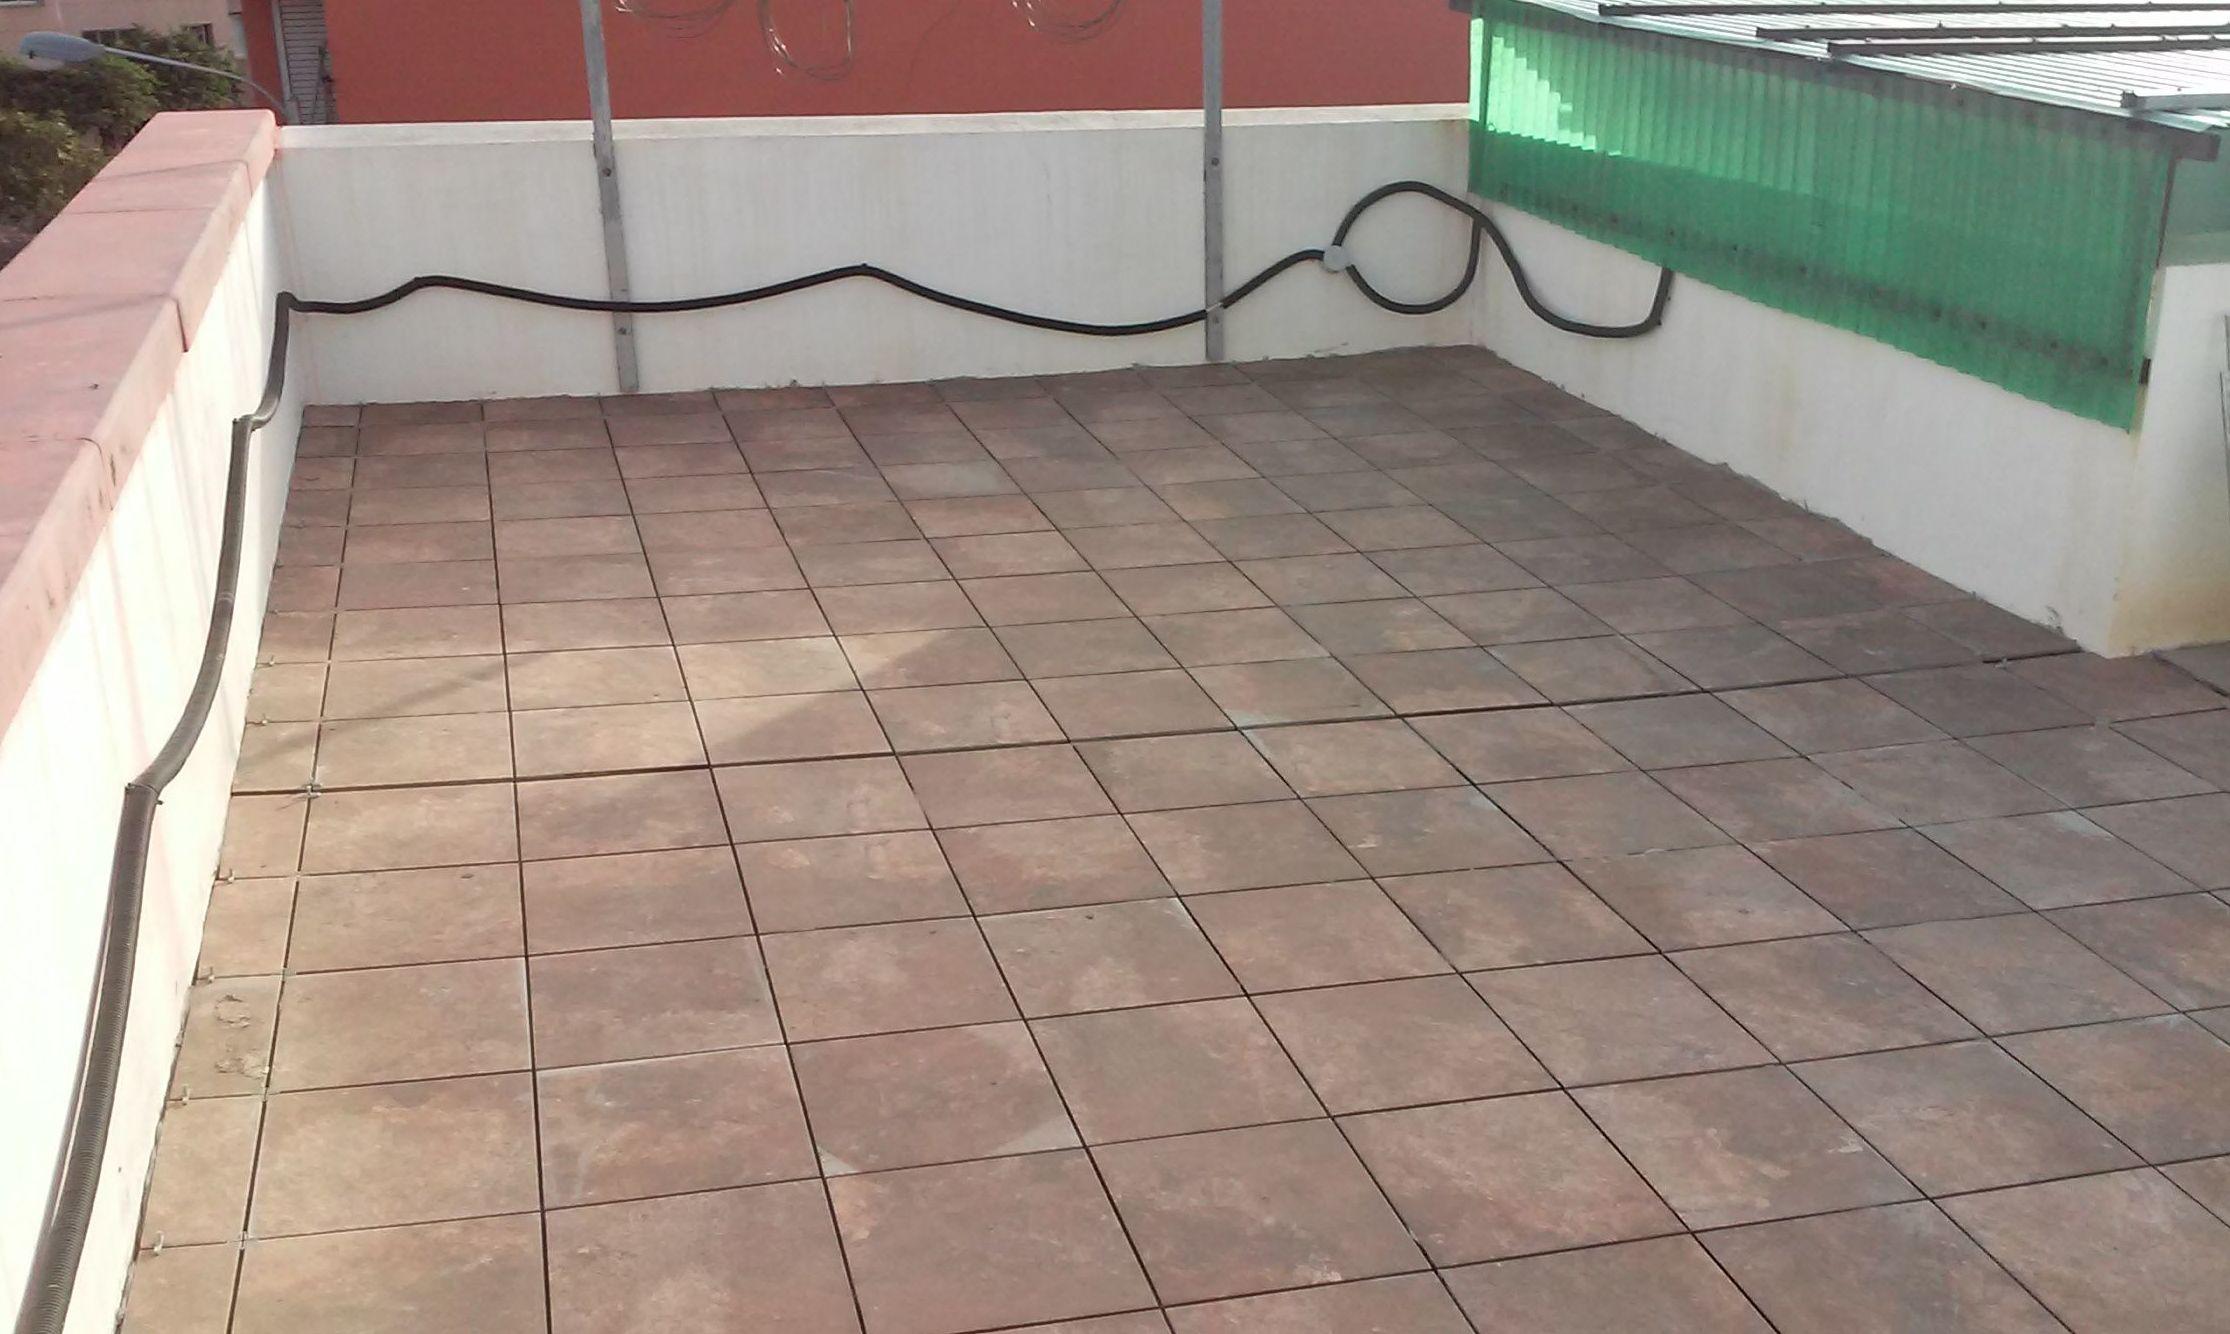 Foto 101 de Impermeabilizaciones en Santa Cruz de Tenerife | Ingarpe